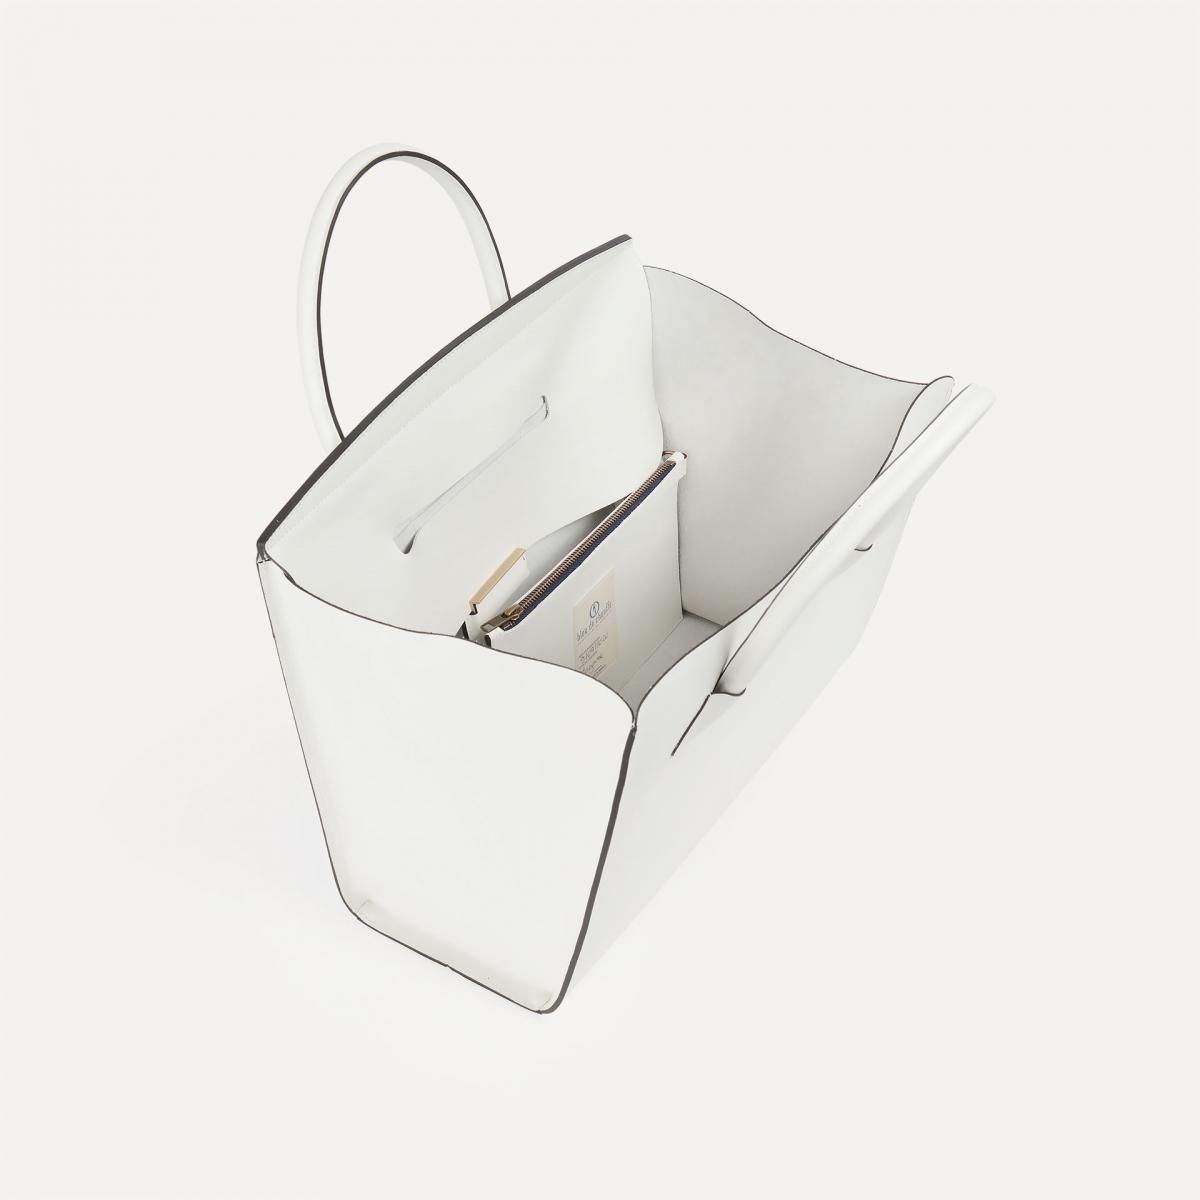 Origami L Tote - White (image n°3)